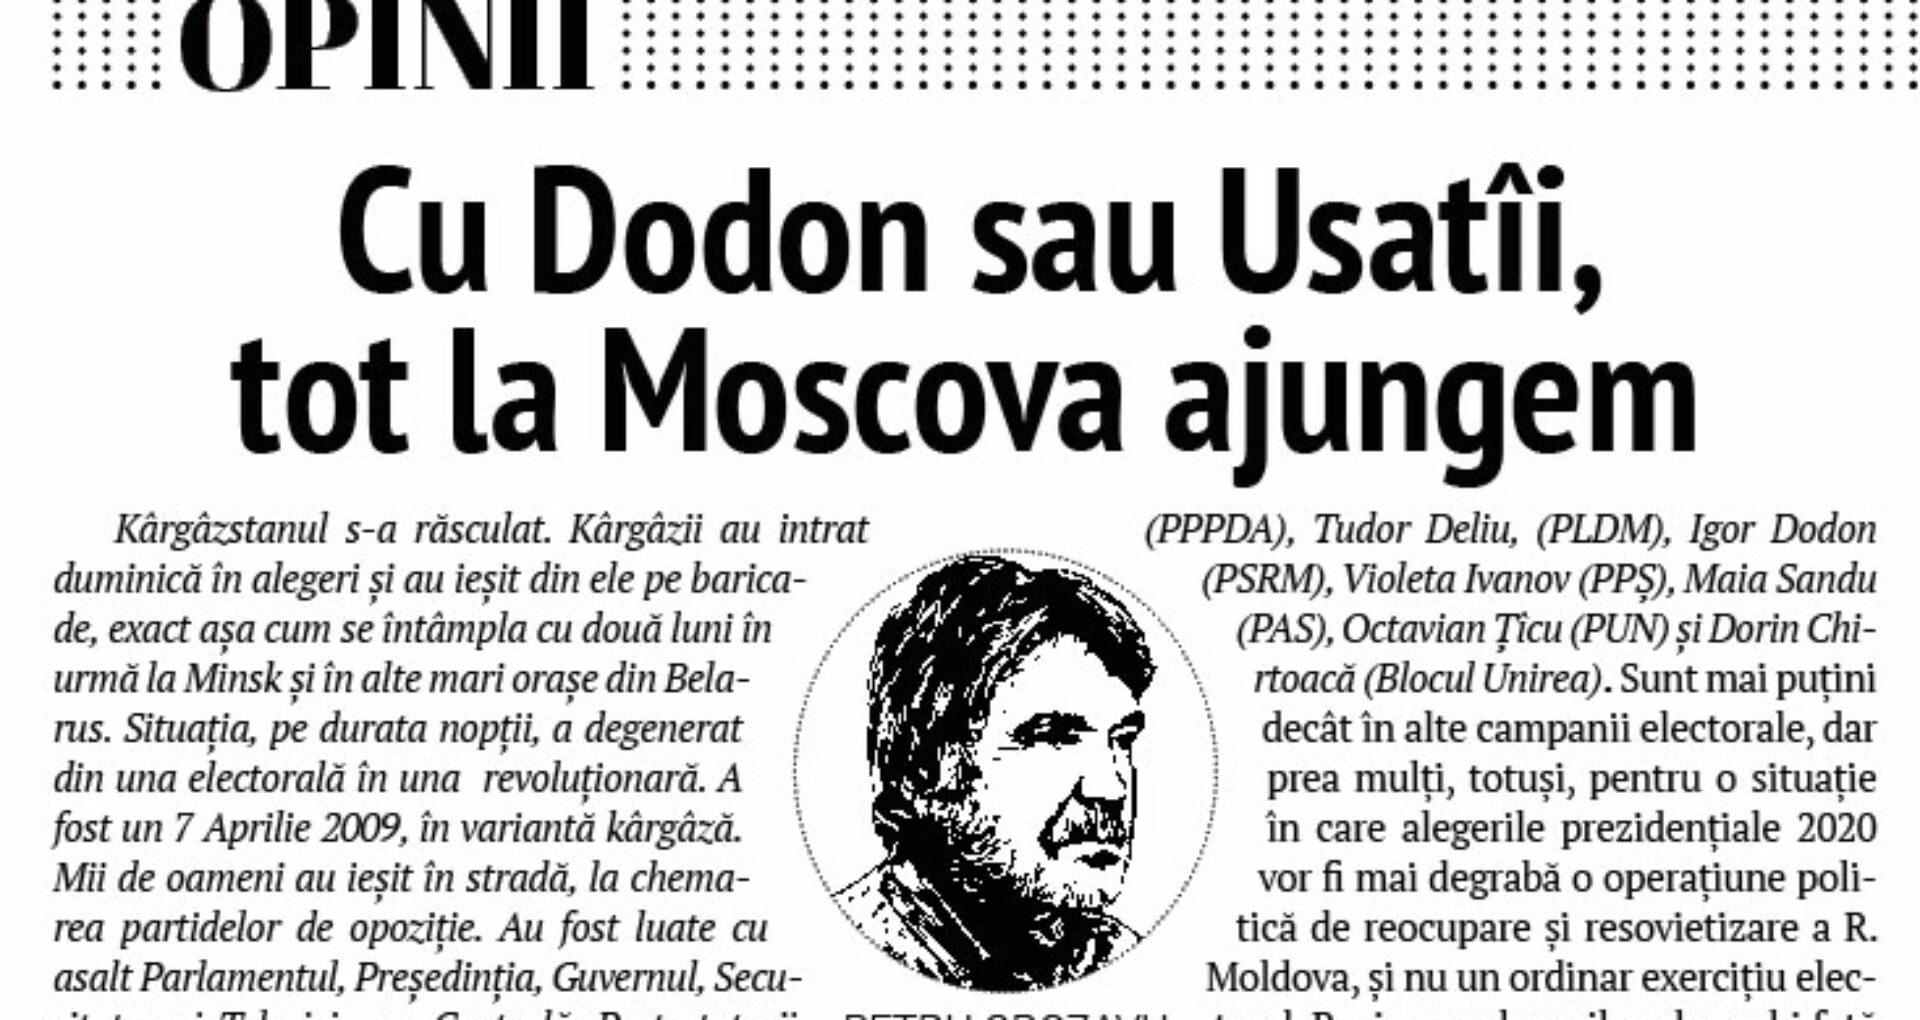 Cu Dodon sau Usatîi, tot la Moscova ajungem